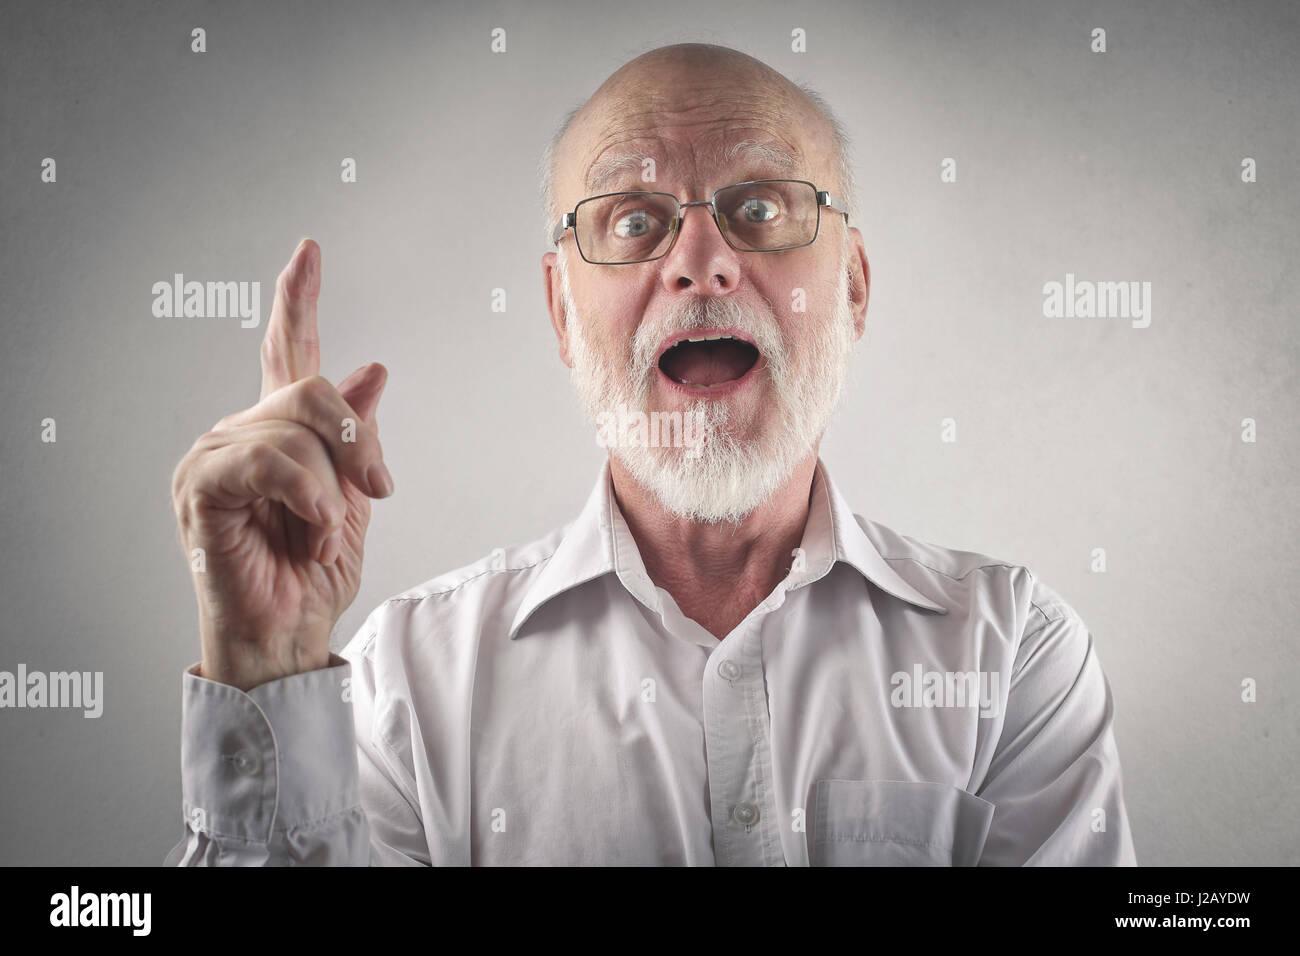 Old man having an idea - Stock Image